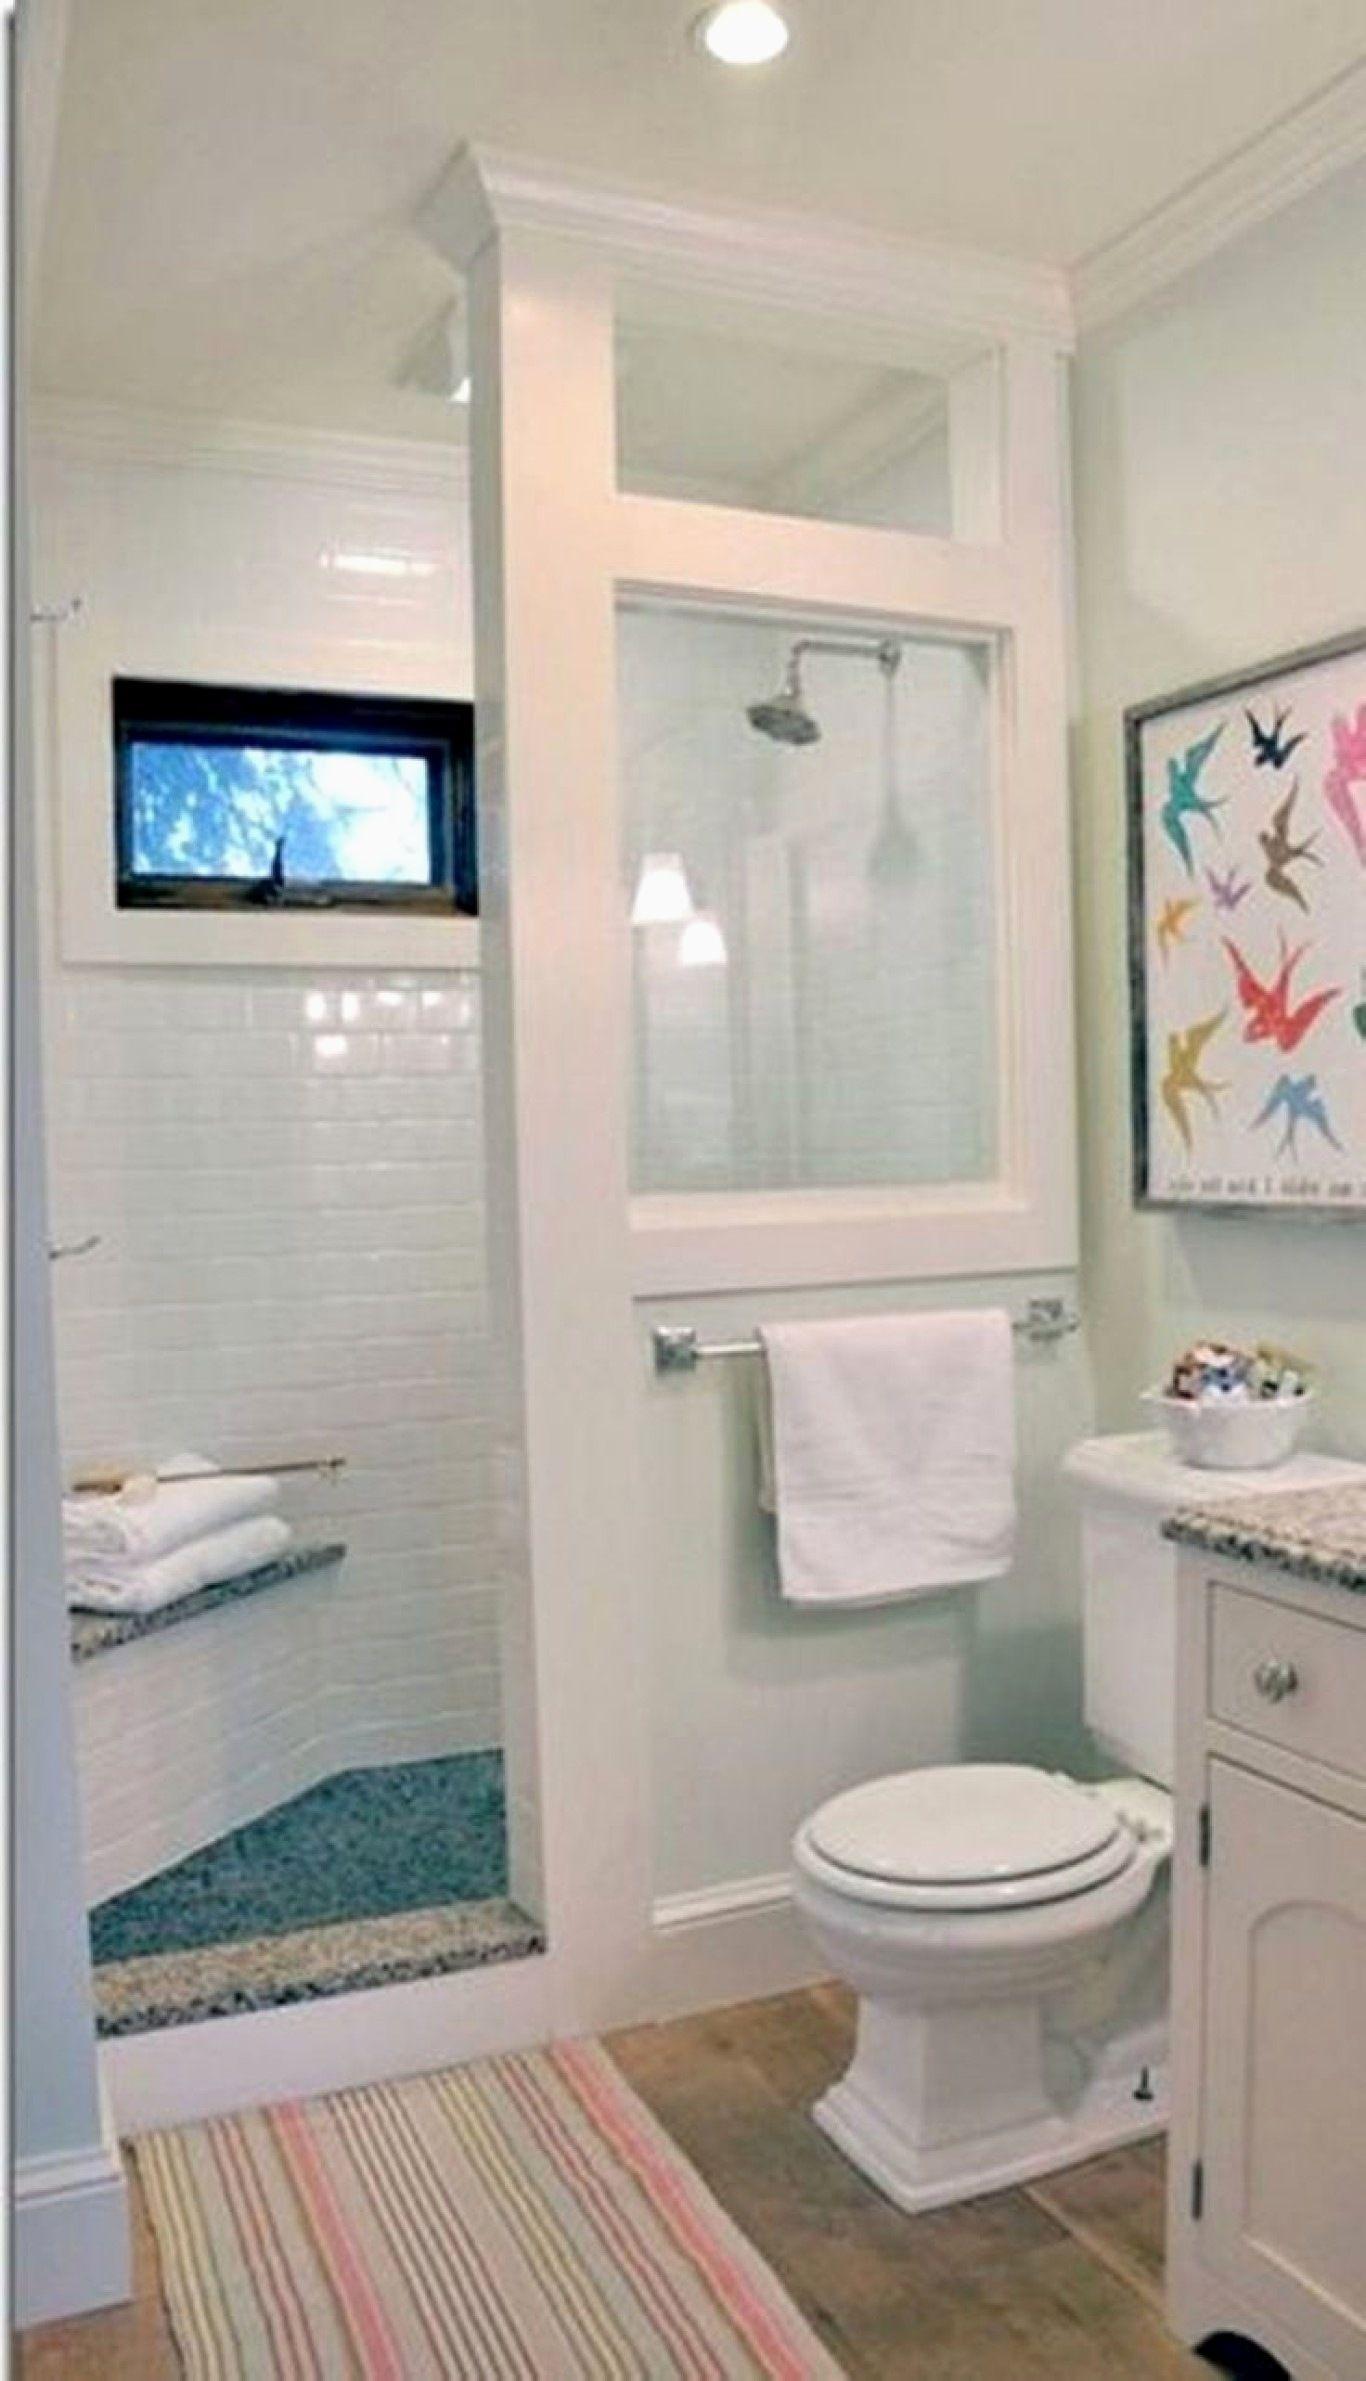 Small Country Bathroom Ideas Luxury Country Bathroom Ideas For